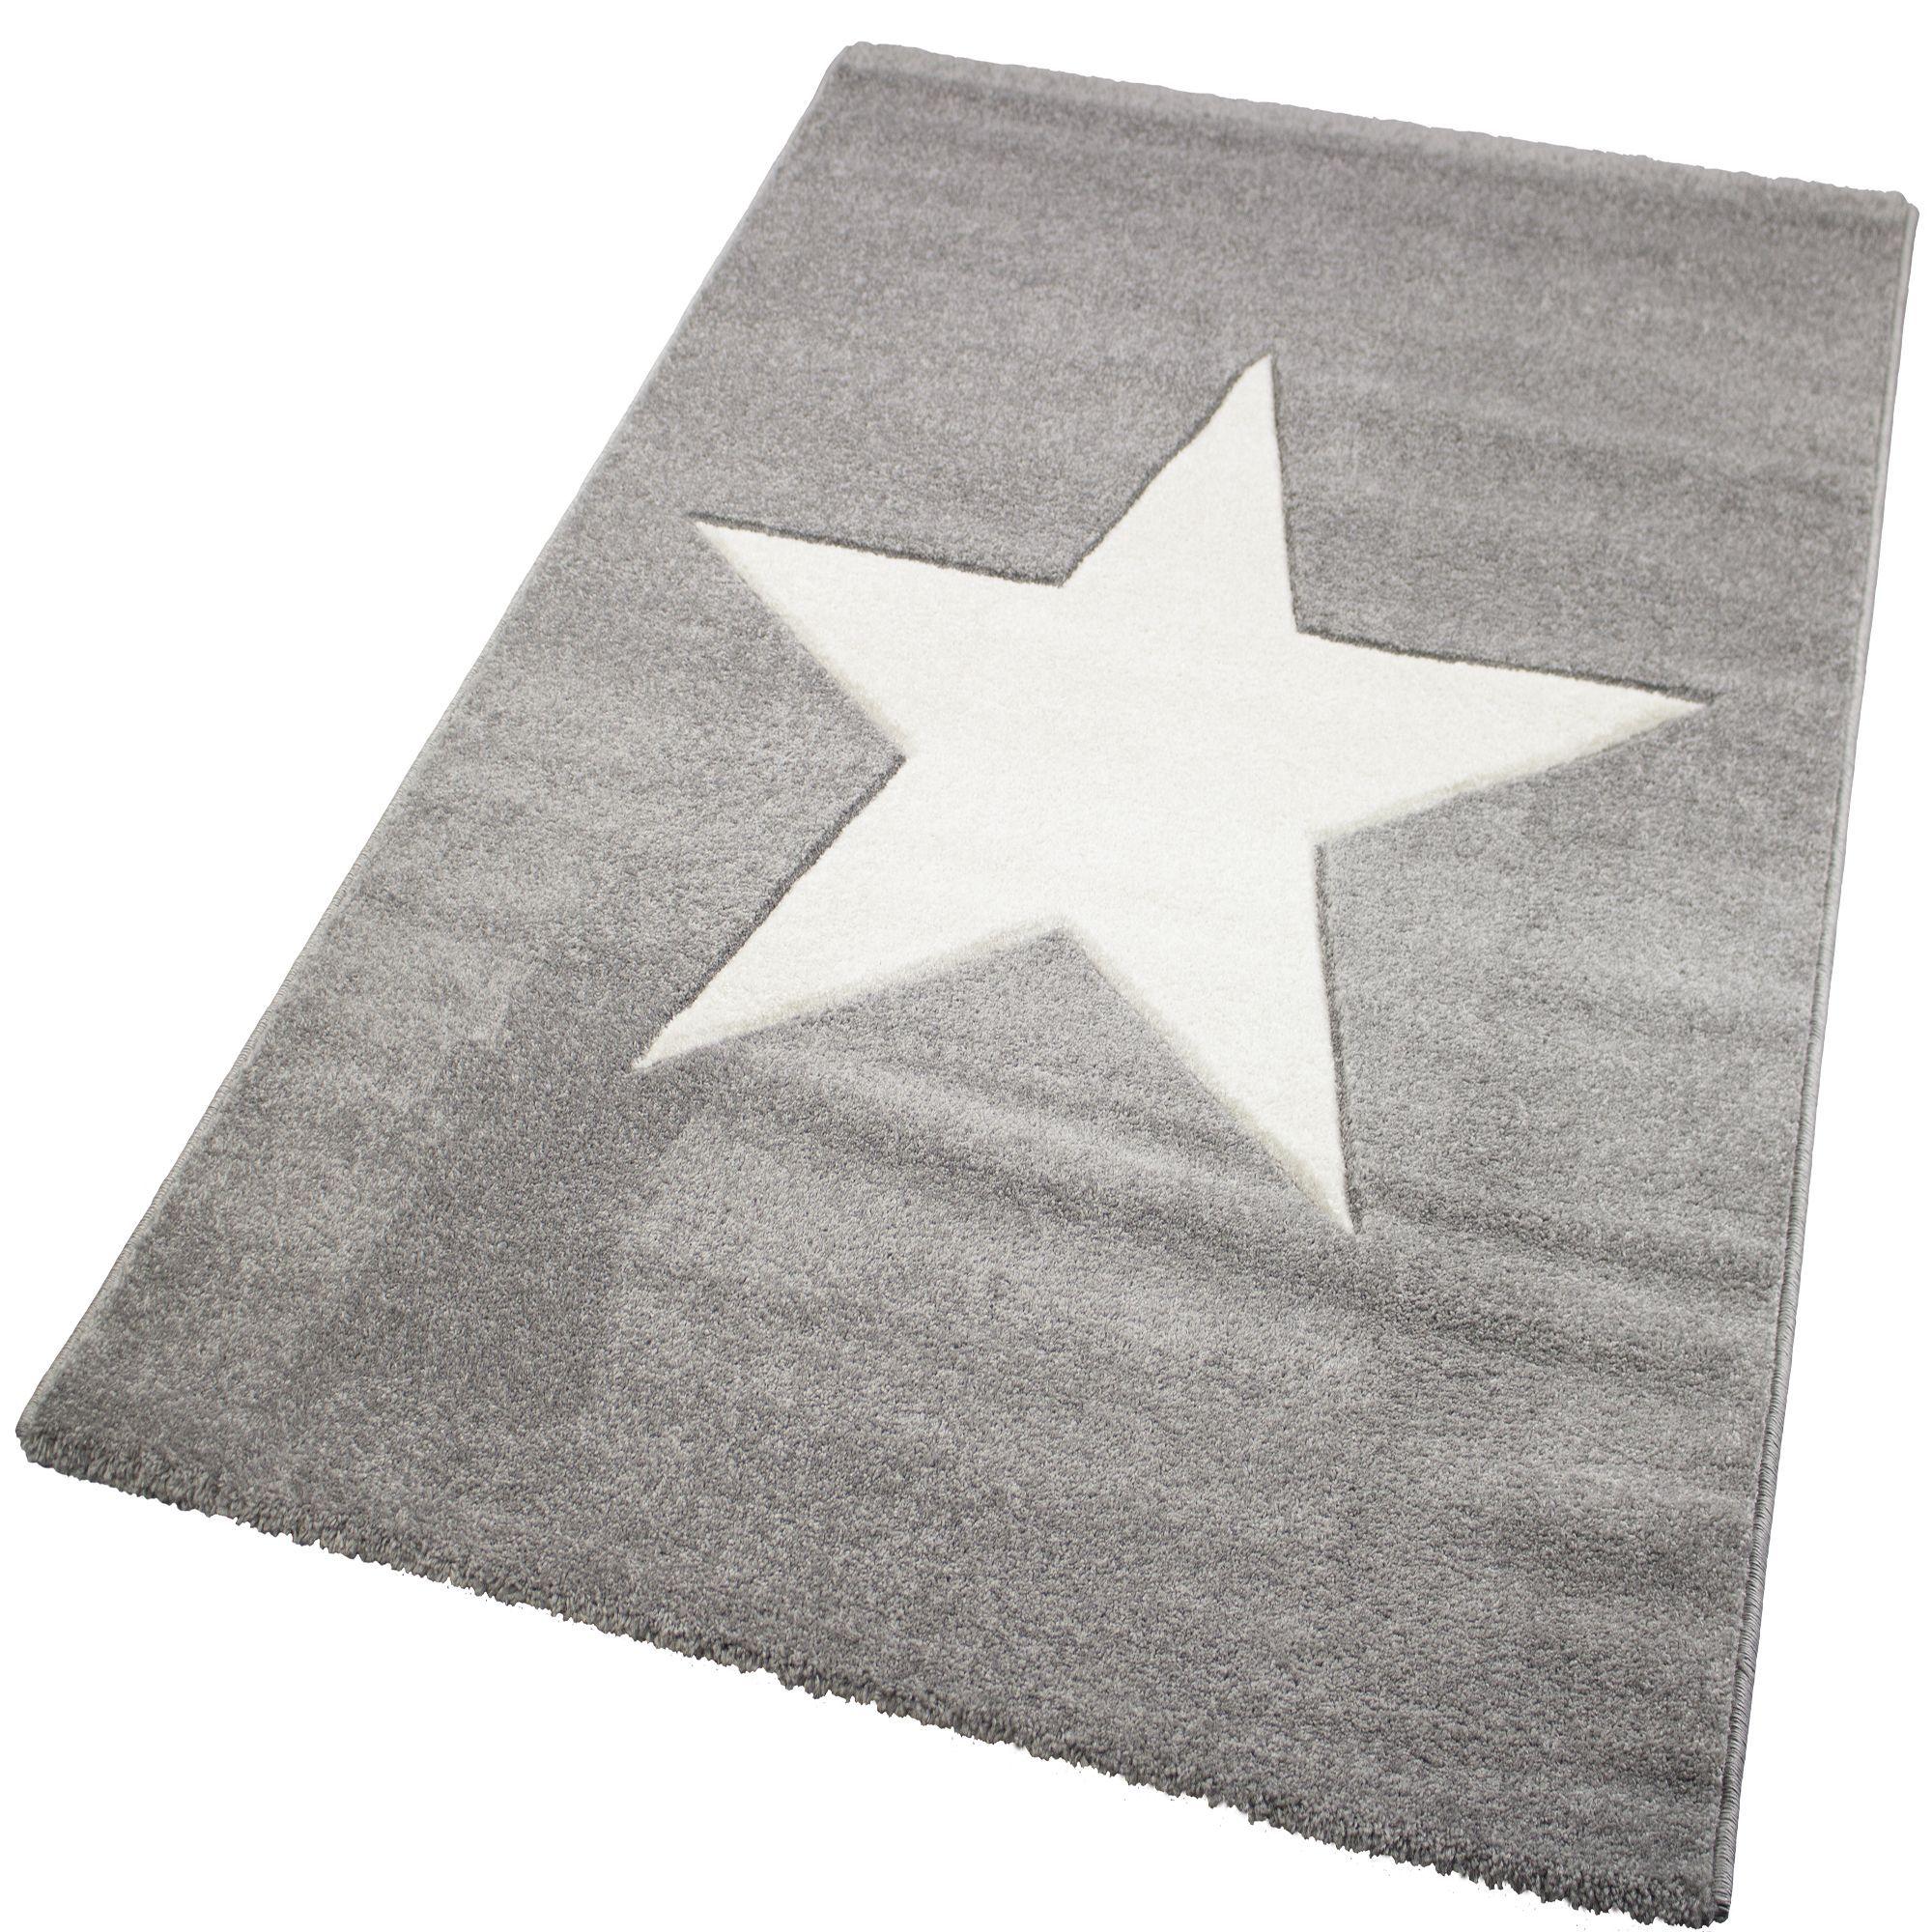 Tapis gris 120x170cm   smith   les tapis textiles et tapis salon ...